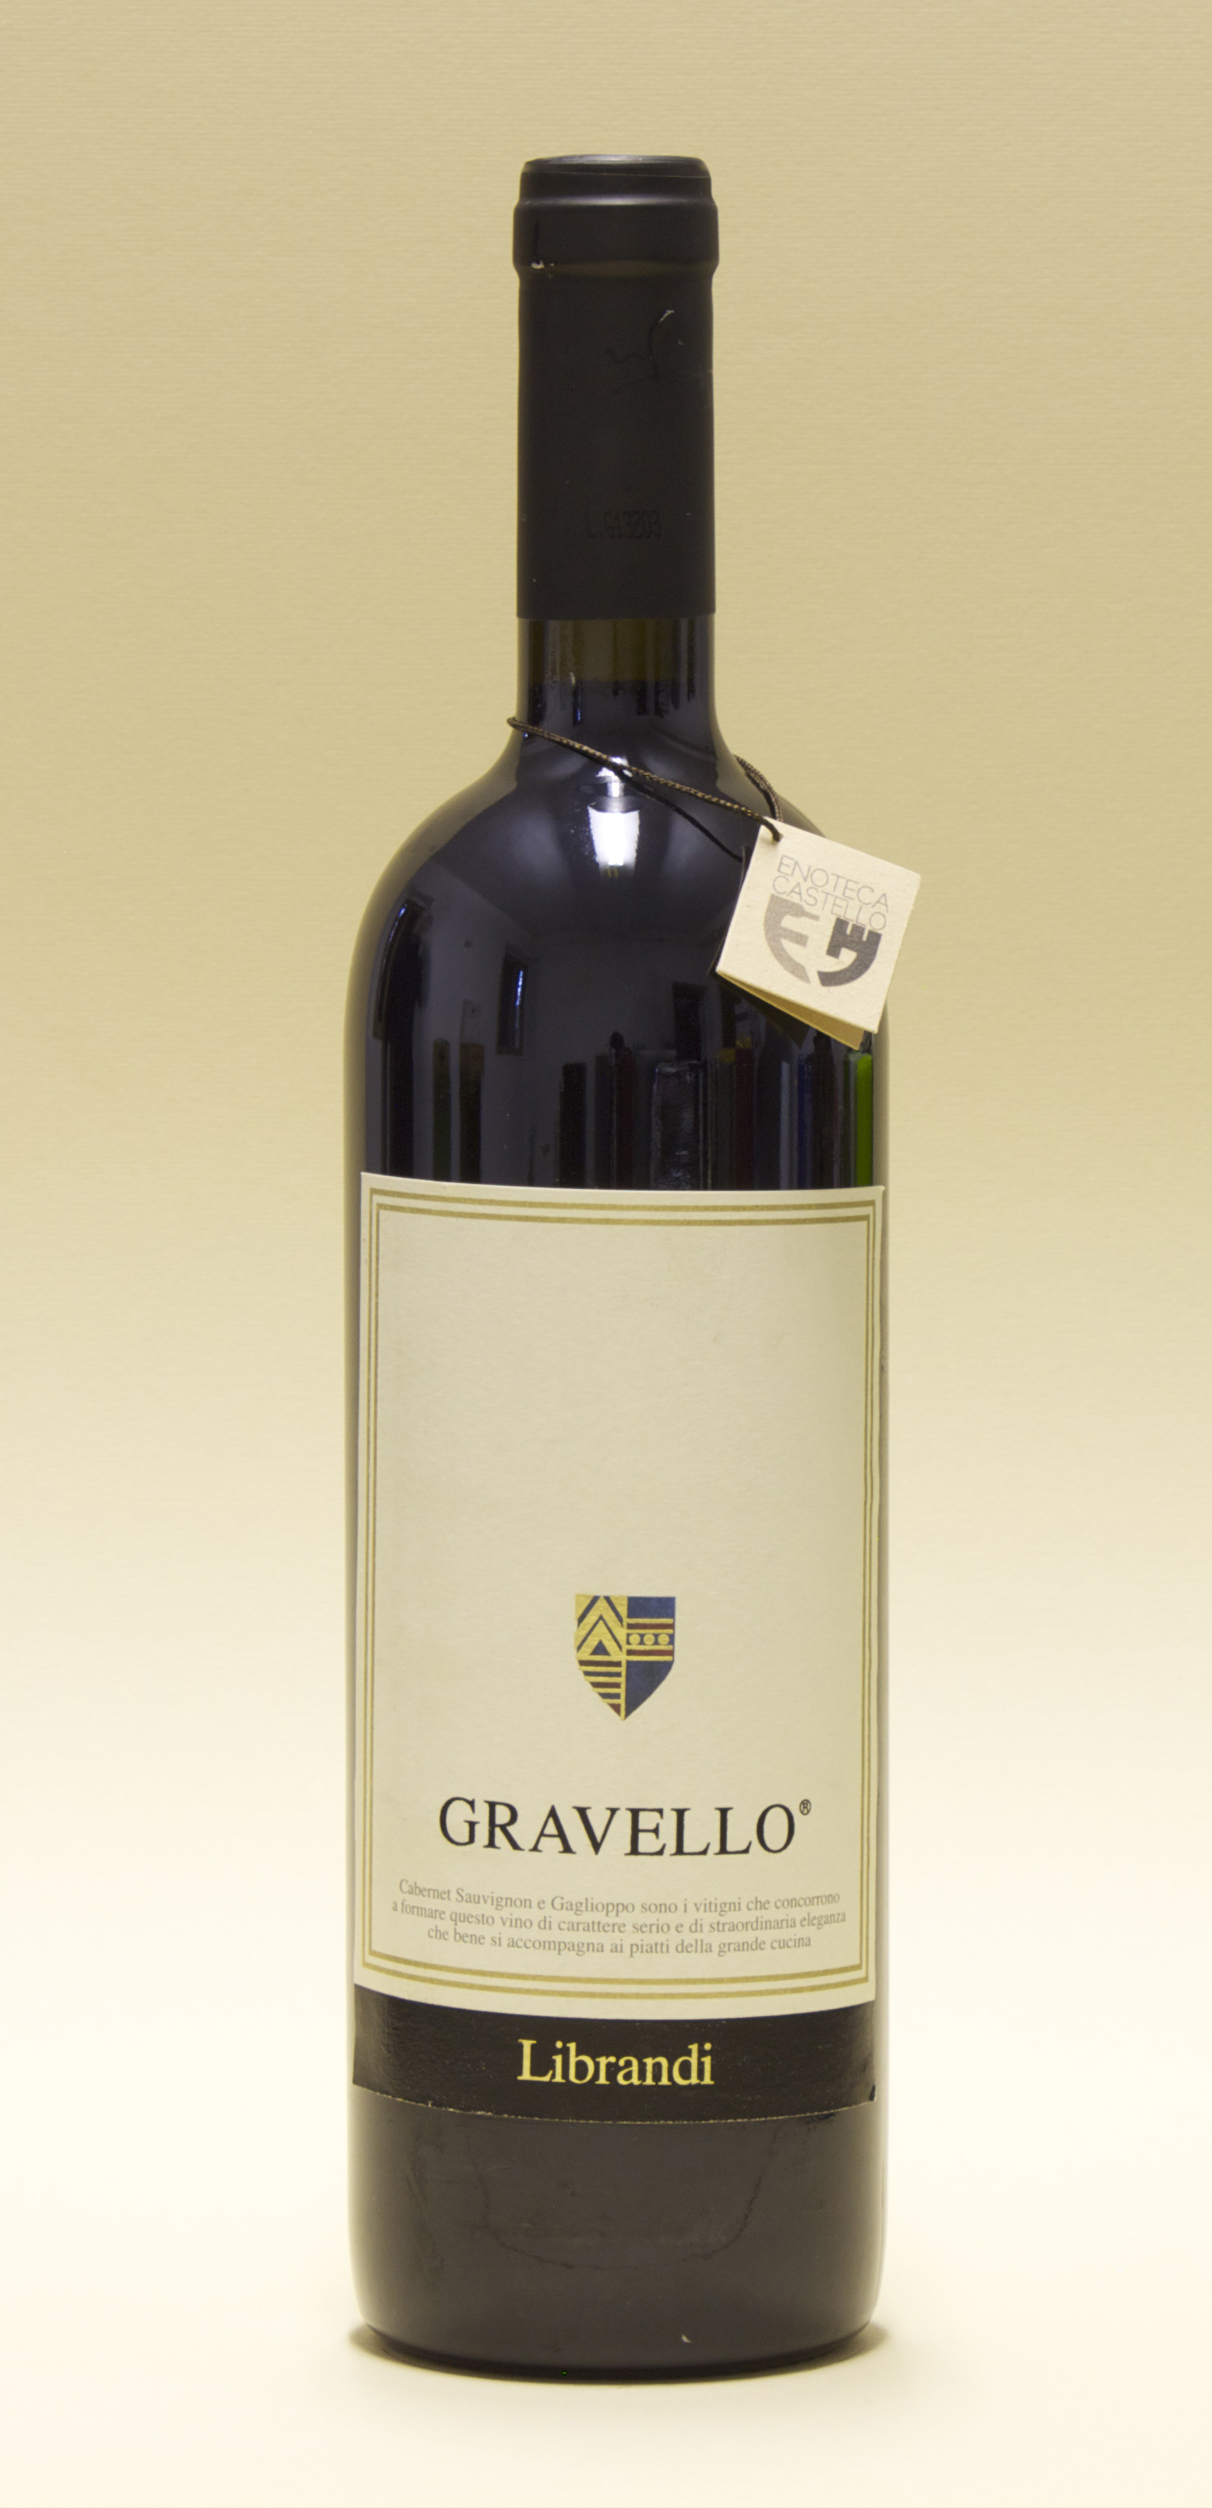 vendita vini piemontesi online dating